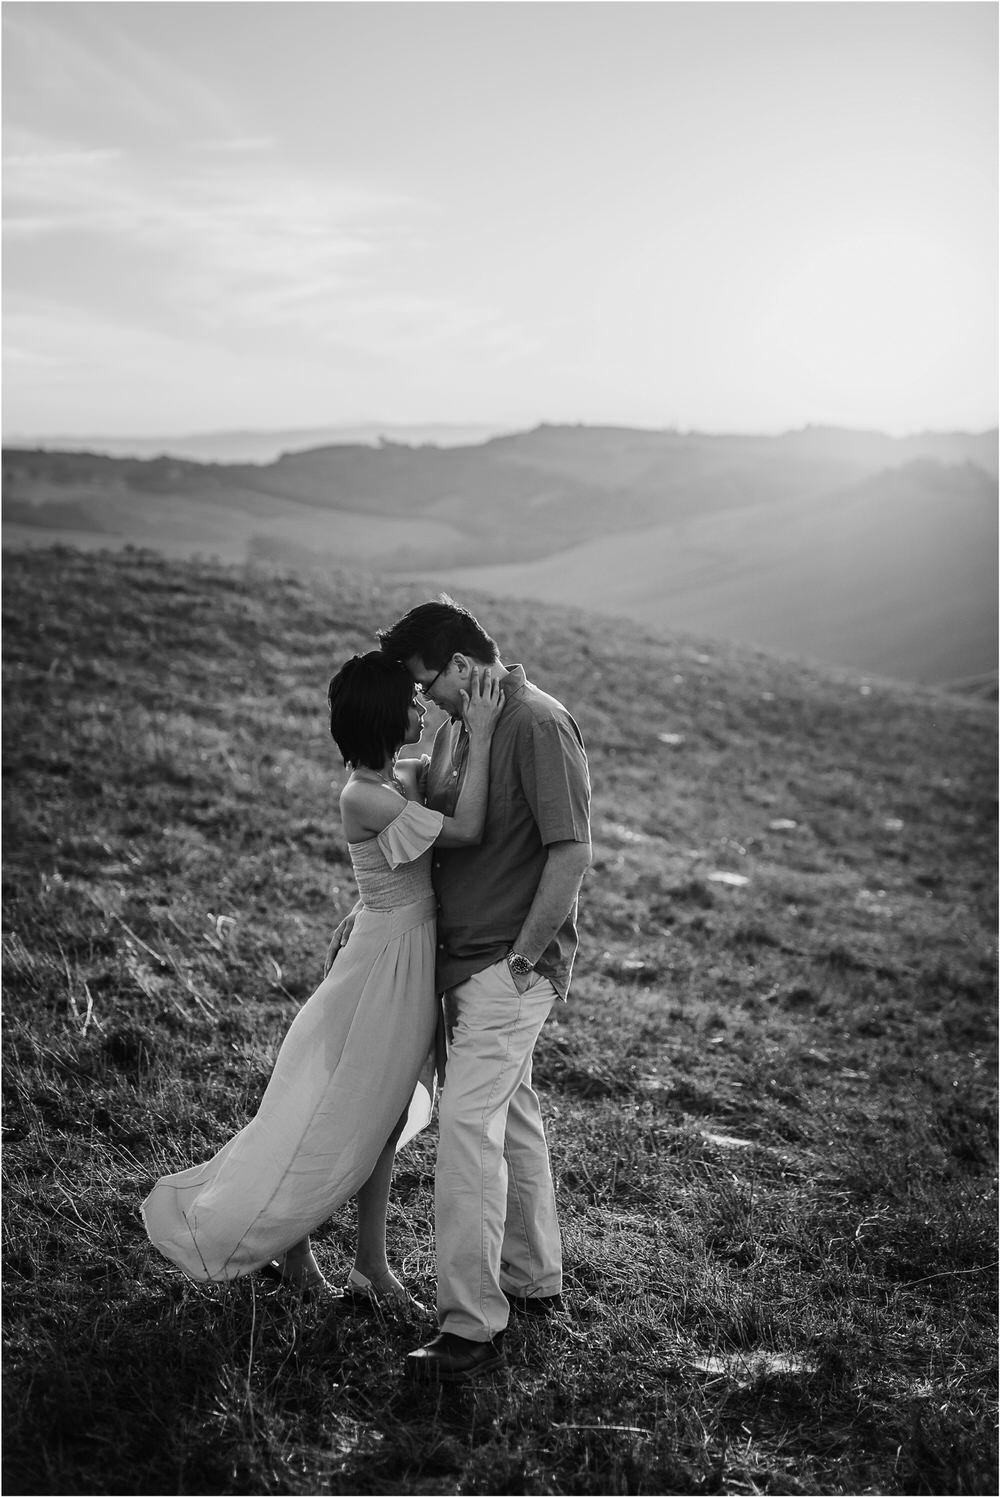 tuscany wedding photographer greece croatia dubrovnik vjencanje hochzeit wedding photography photos romantic engagement nika grega 0097.jpg